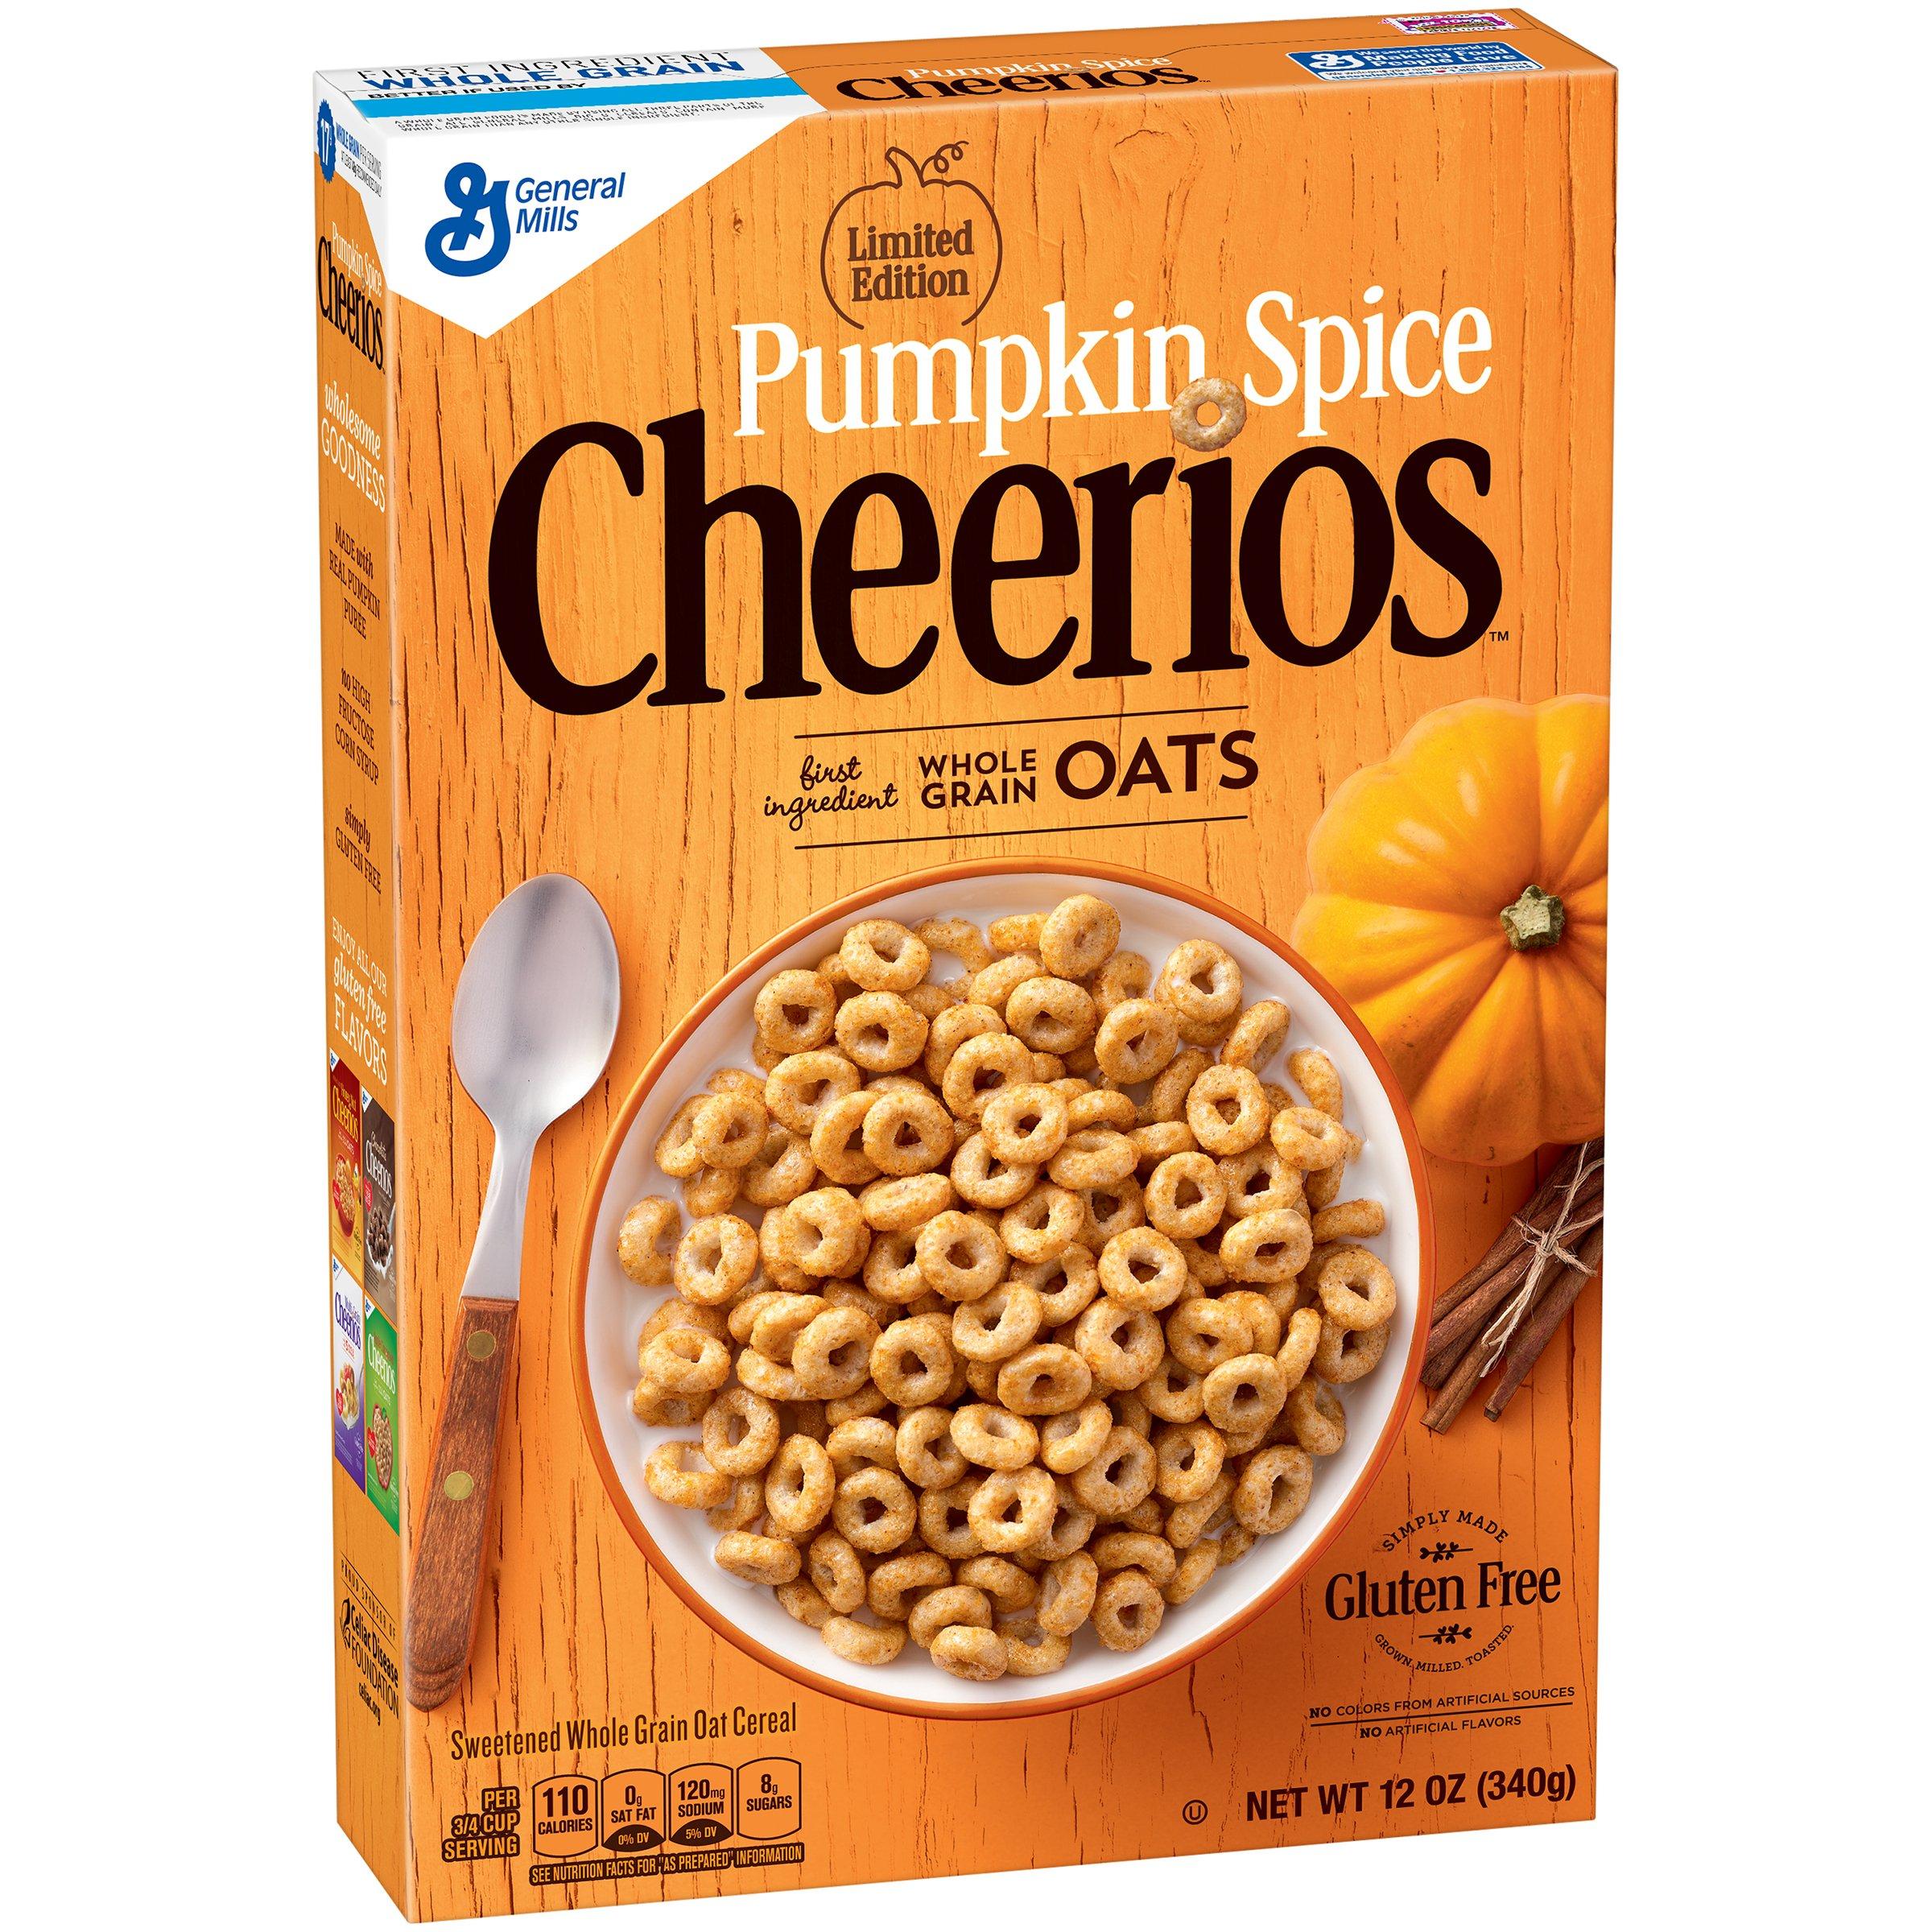 Pumpkin Spice Cheerios Limited Edition Cereal, 12 oz